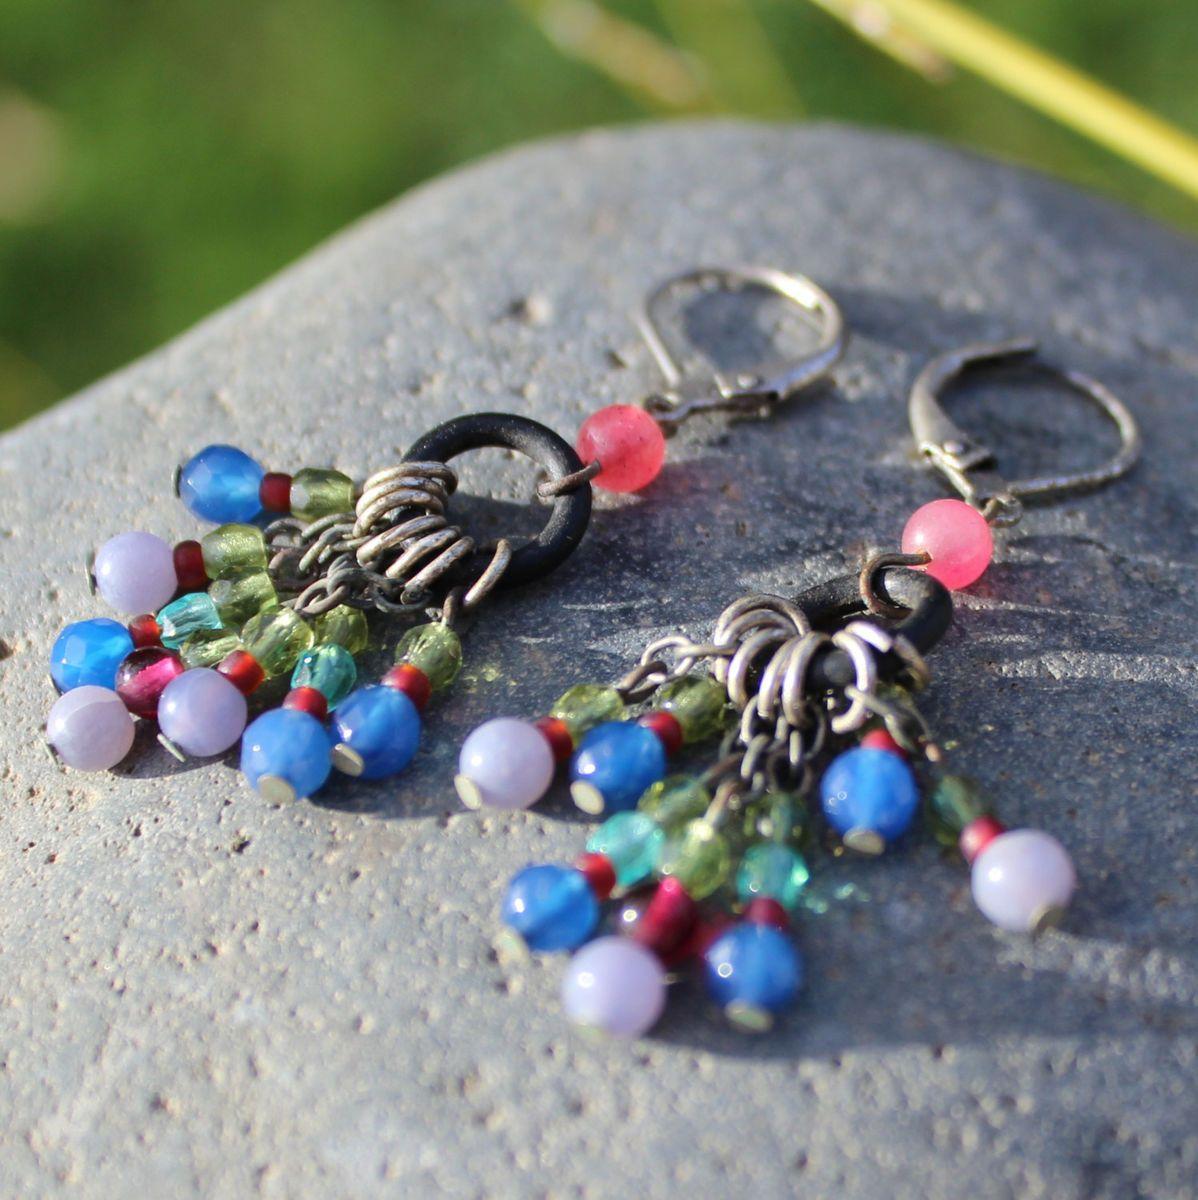 Chandeliers earrings bridal boho earrings gypsy earrings chandeliers earrings bridal boho earrings gypsy earrings hippie long earrings boho earring aloadofball Images